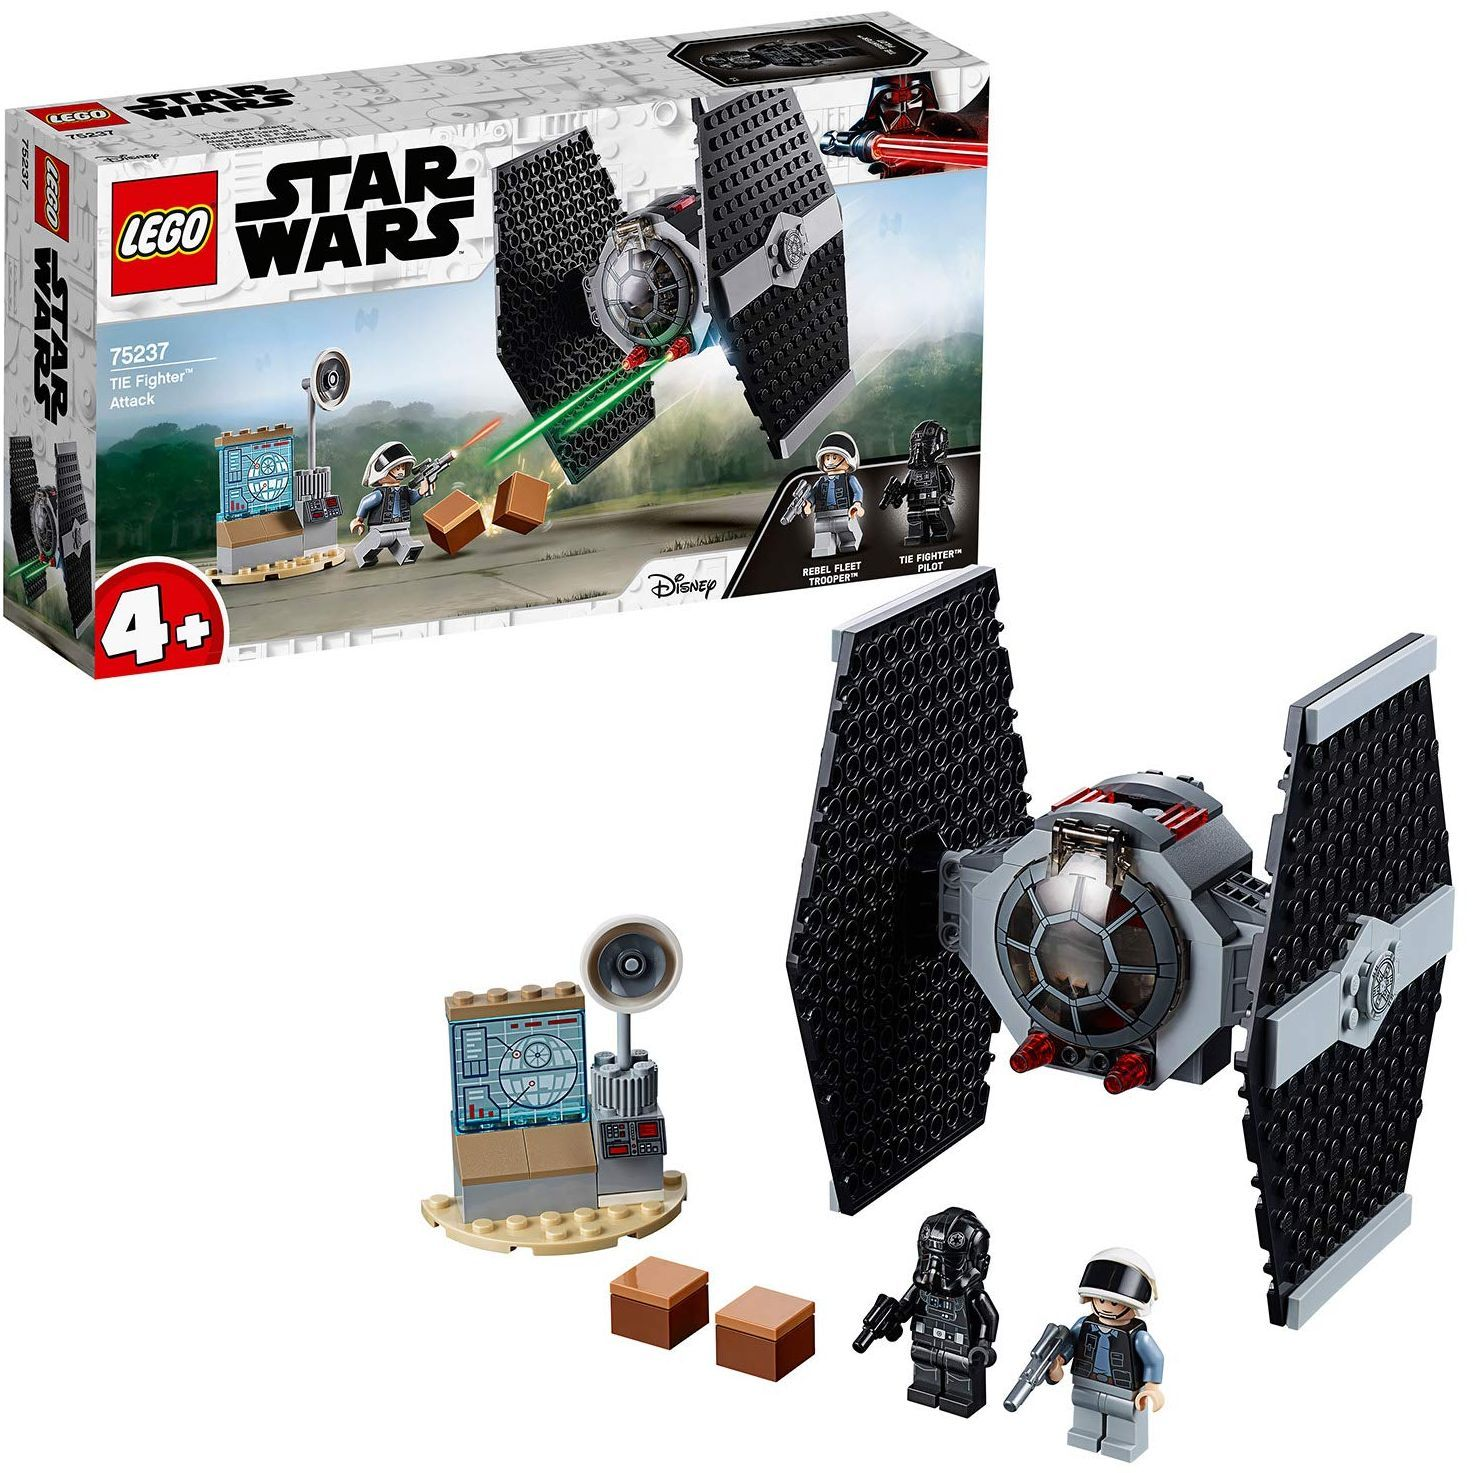 Конструктор Lego Star Wars - TIE Fighter Attack (75237) - 5